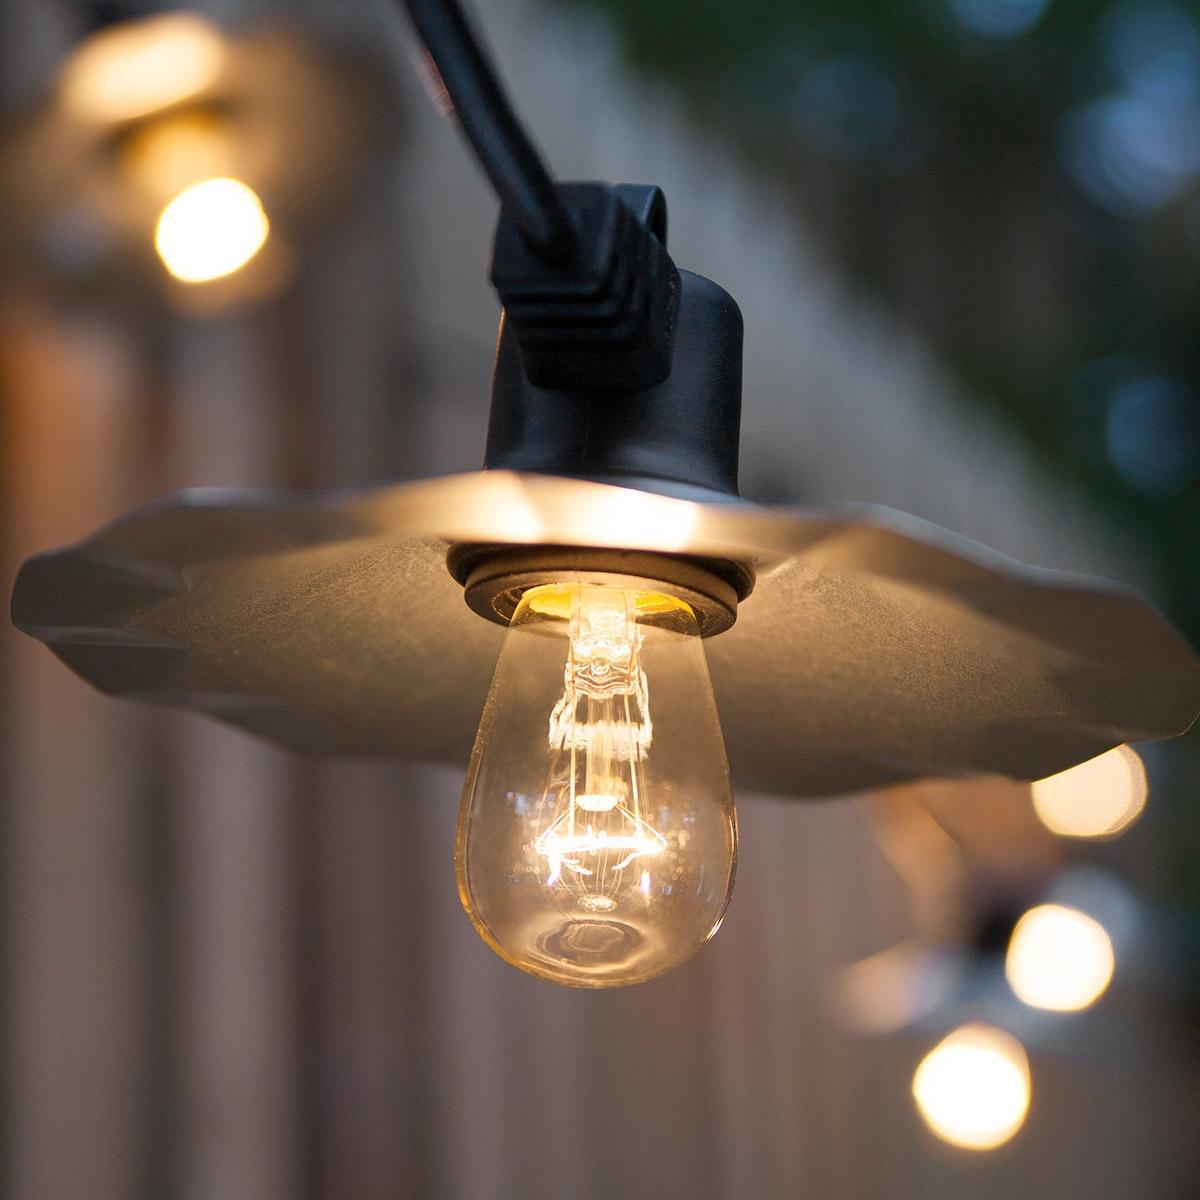 Cafe String Lights, Clear S14 Bulbs, Silver Shades - Yard Envy